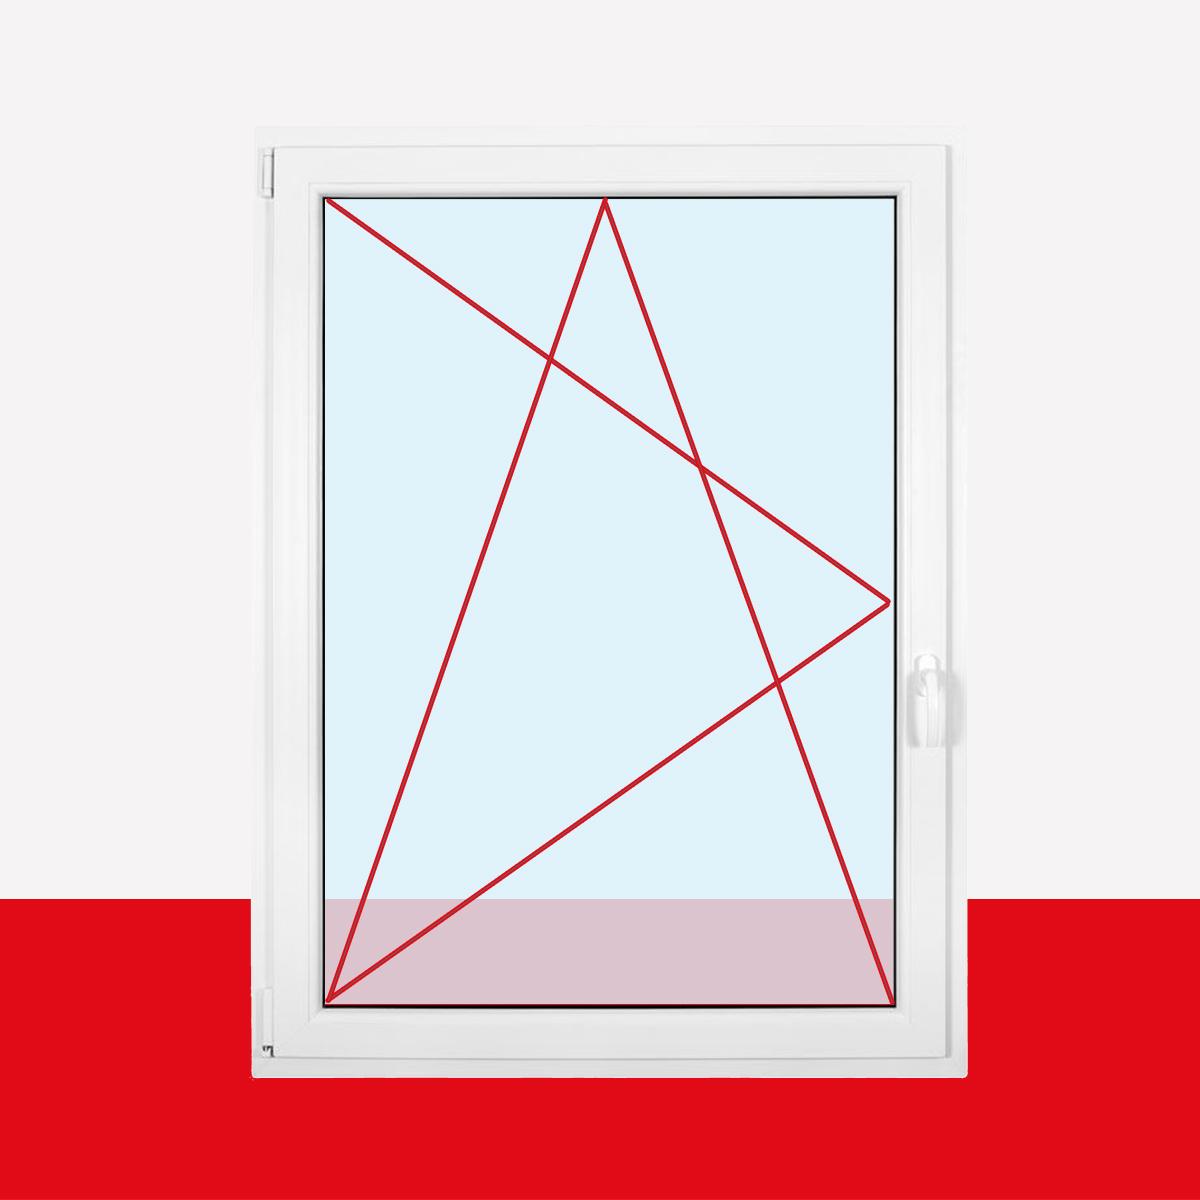 500 x 600 mm Winkhaus Beschlag Isolierglas DIN Links Kellerfenster Kunststoff Fenster Dreh Kipp 50 x 60 cm